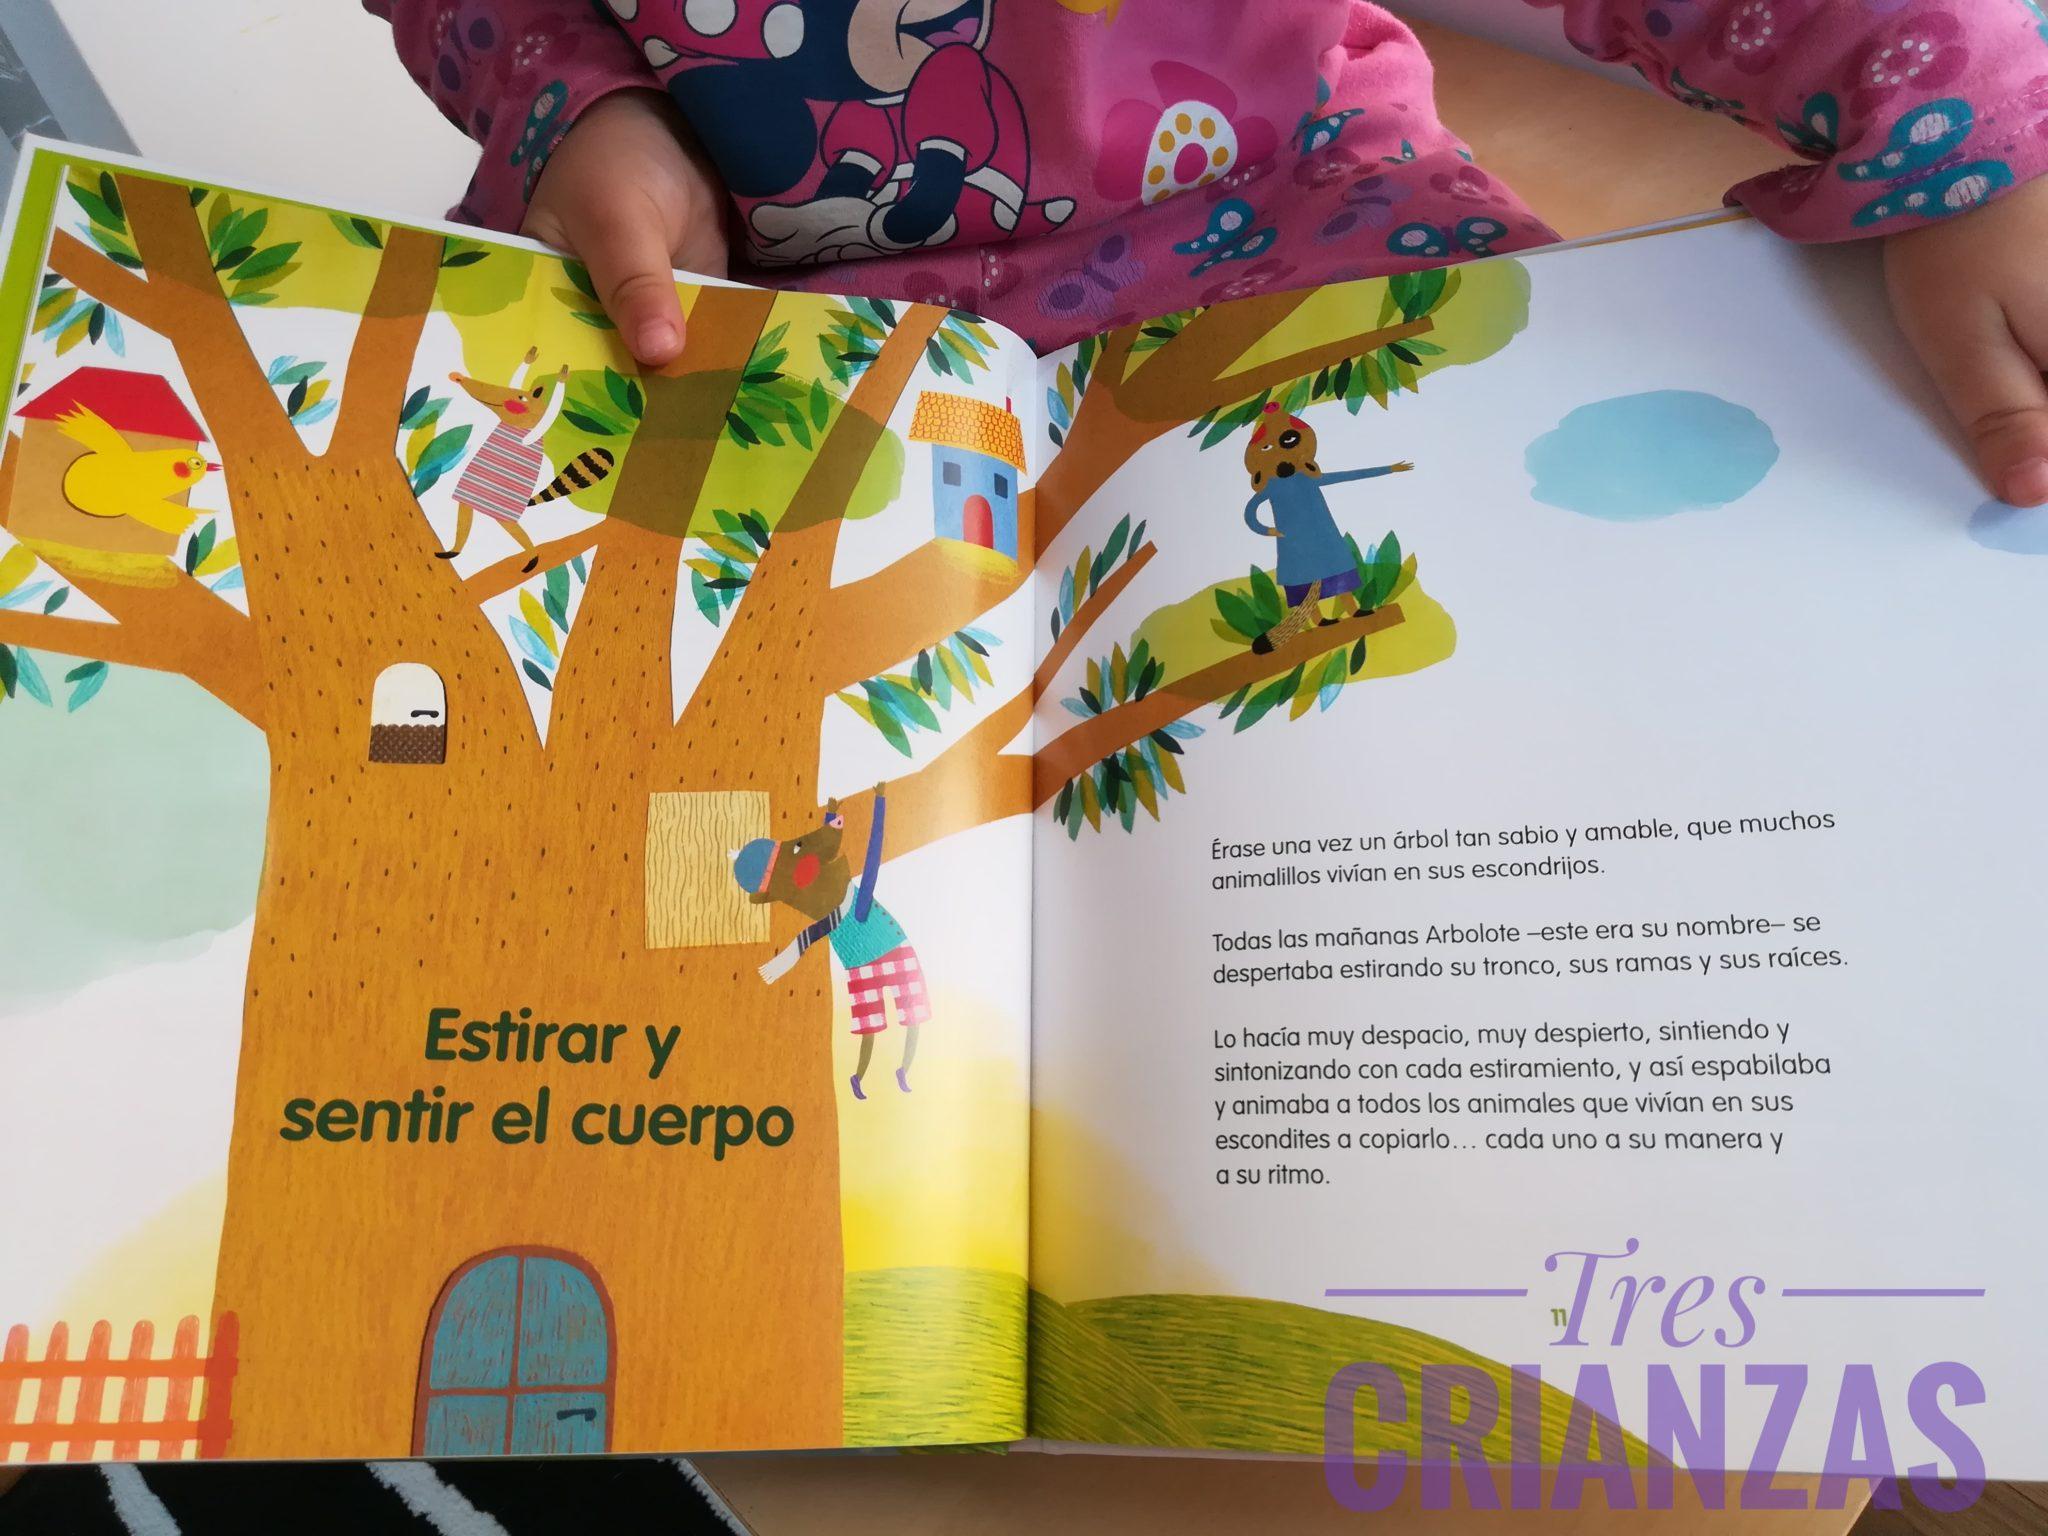 IMG 20180401 143444 01 - Mindfulness para niños con Beni y Bela meditan